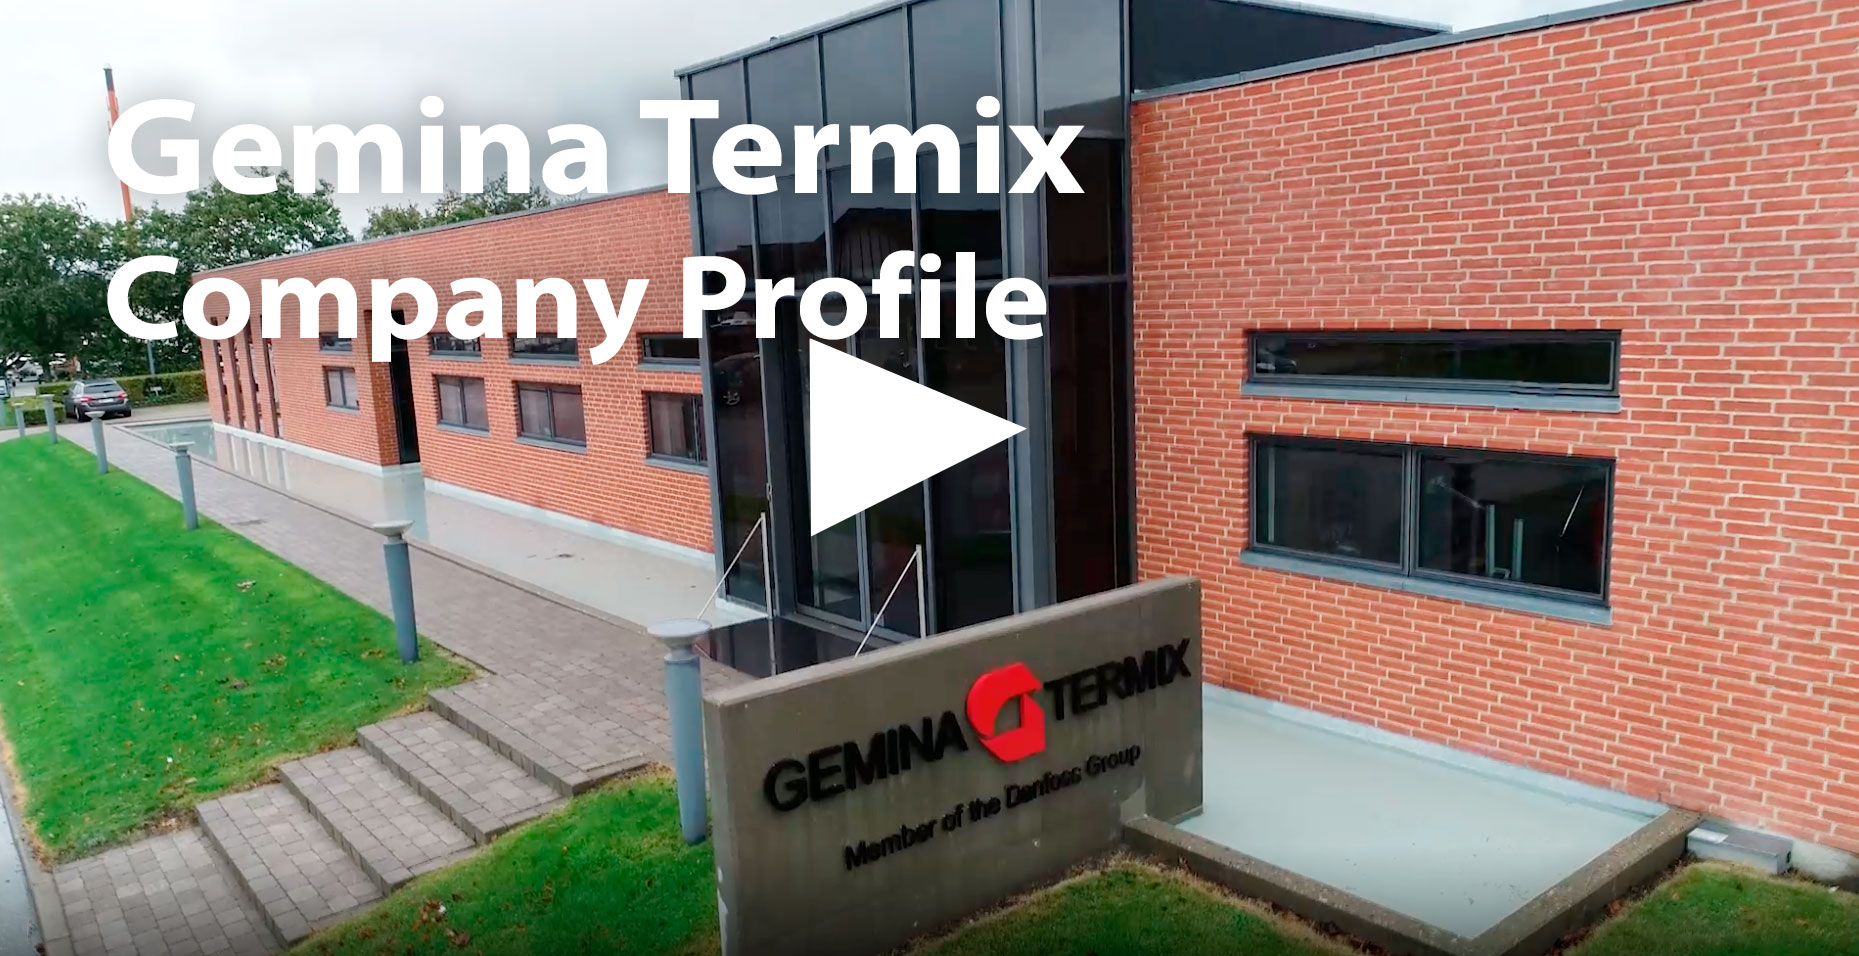 Gemina Termix company profile